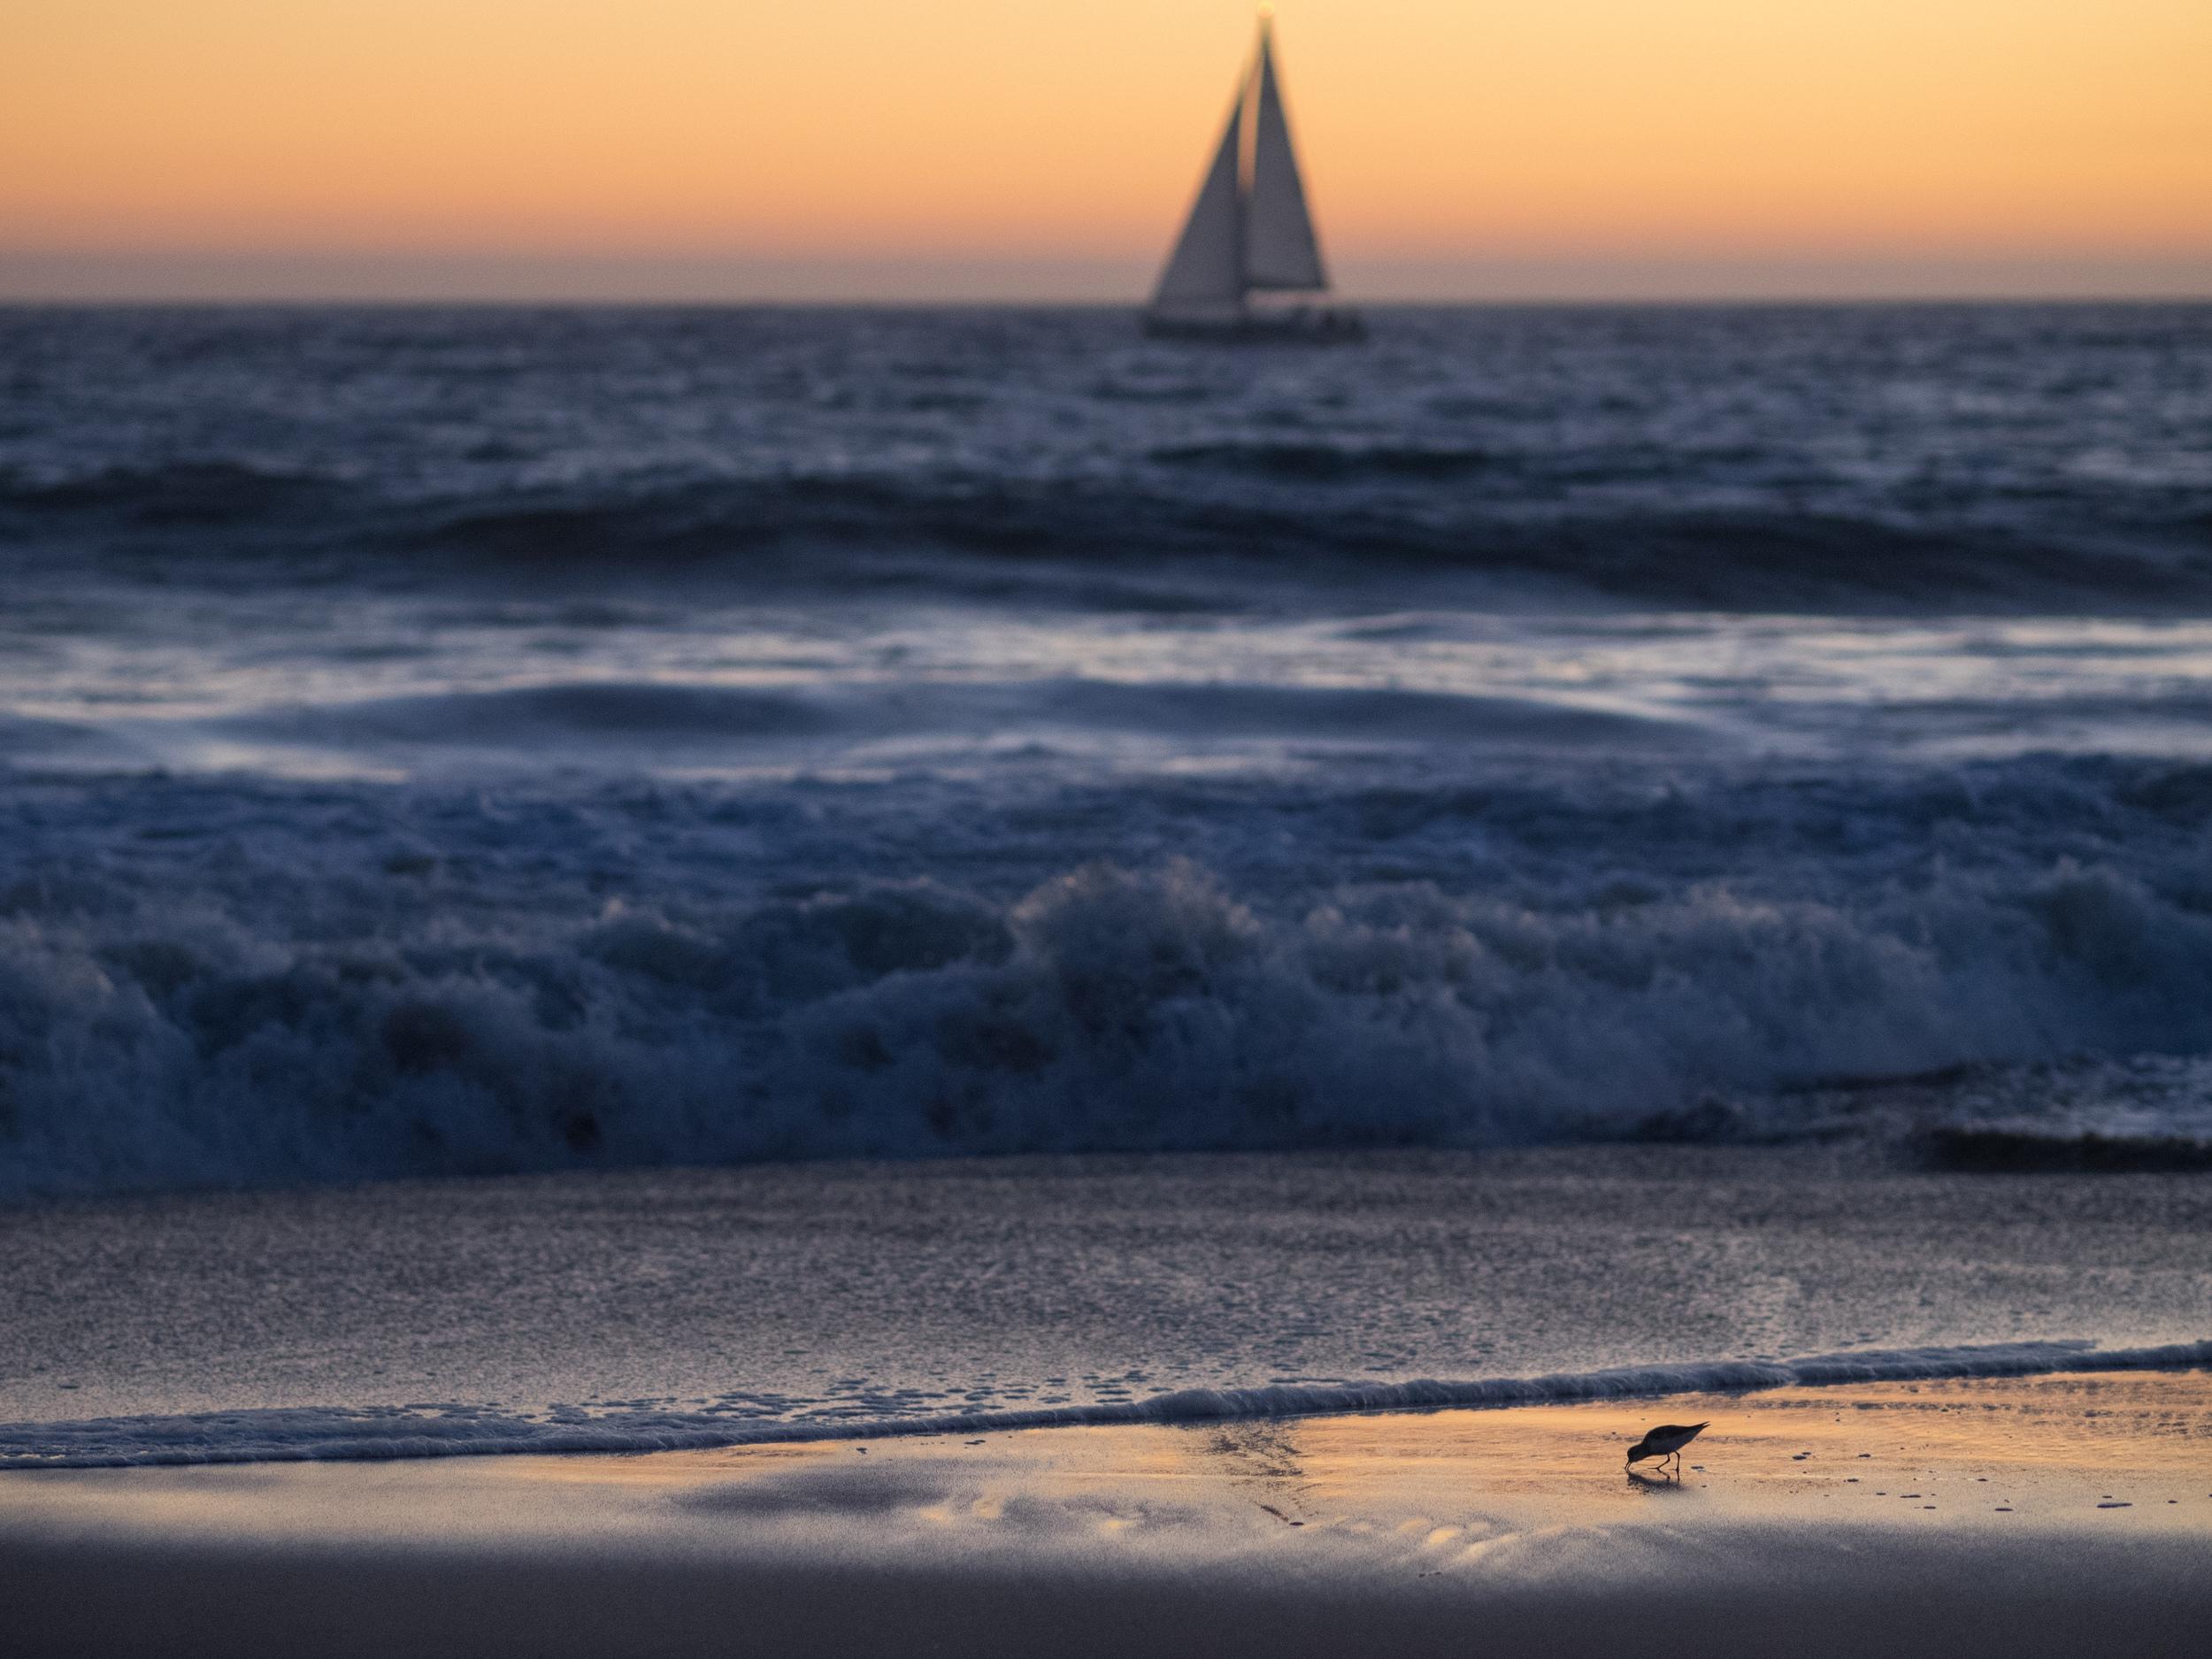 Sailboat & Sandpiper